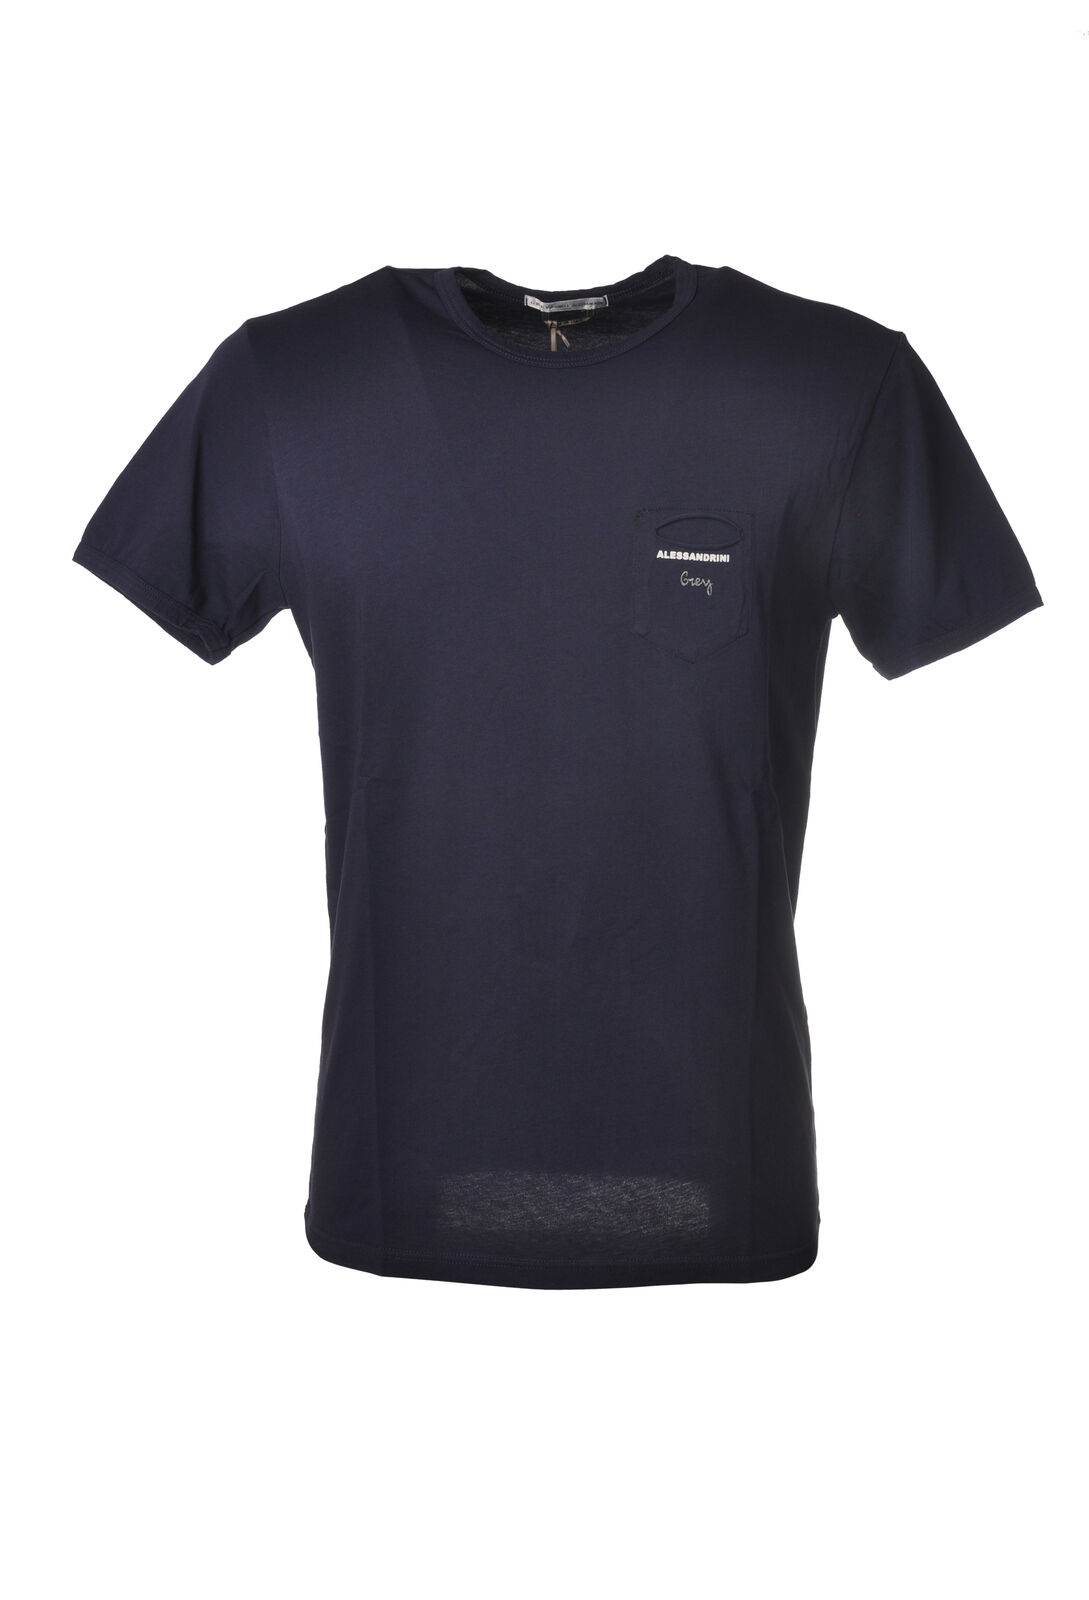 Daniele Alessandrini - Topwear-T-hemds - Man - Blau - 6445023I191459